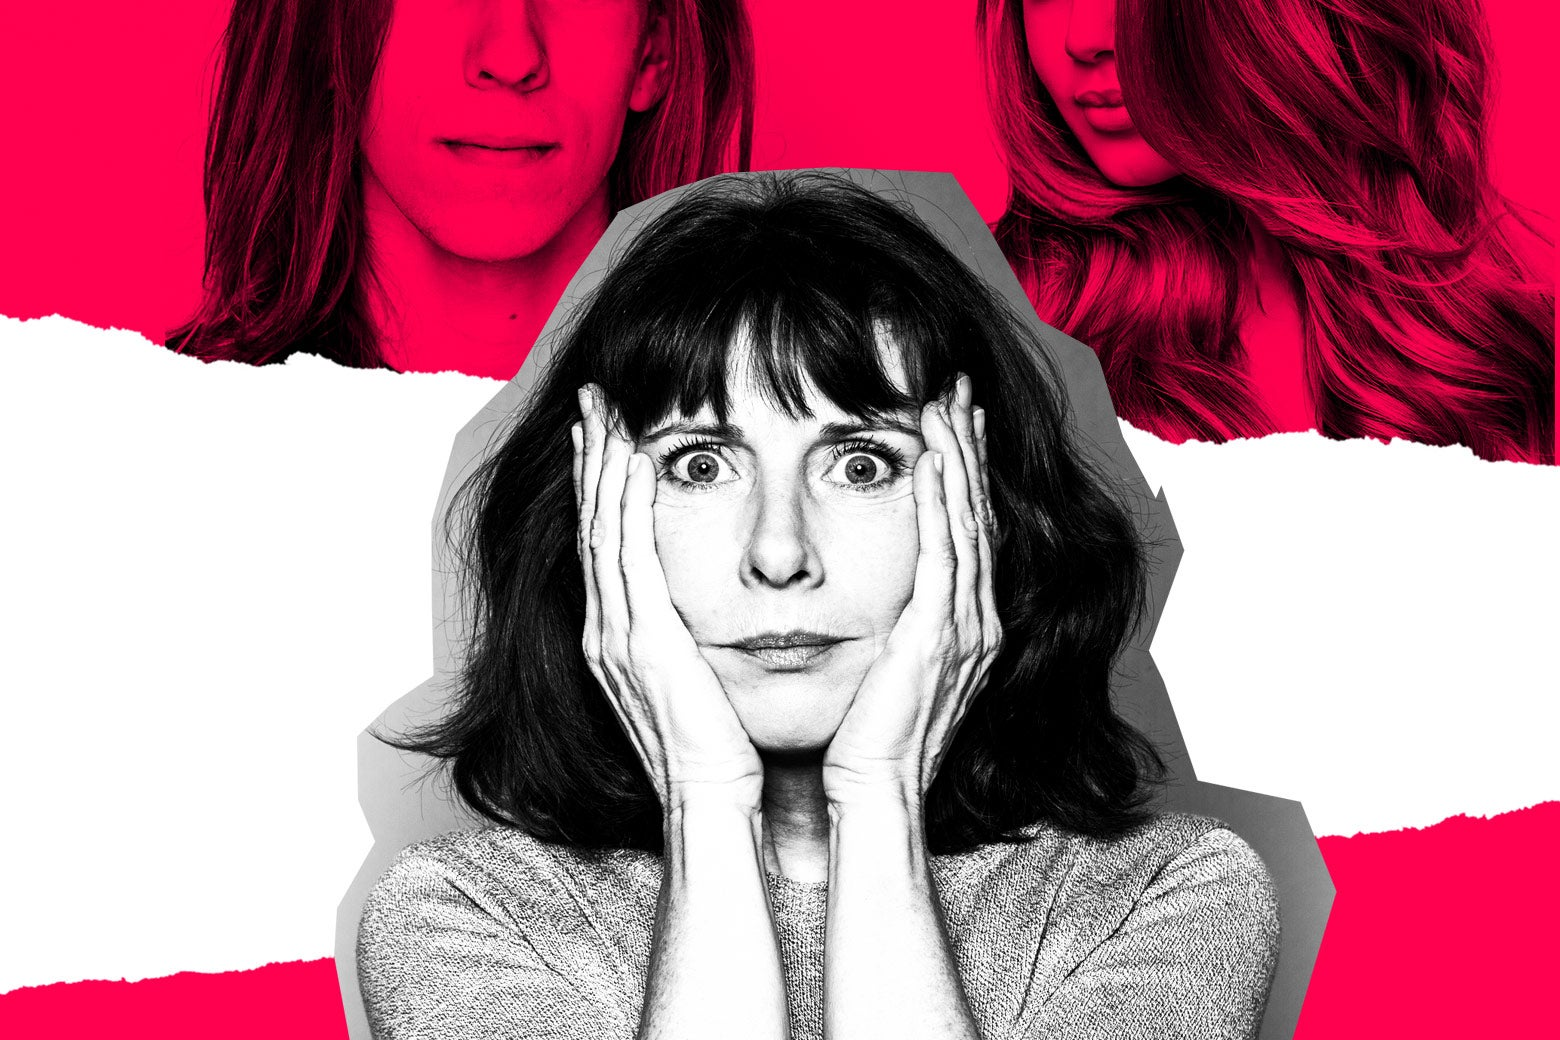 Transgender dating problemen dating iemand met paranoïde schizofrenie